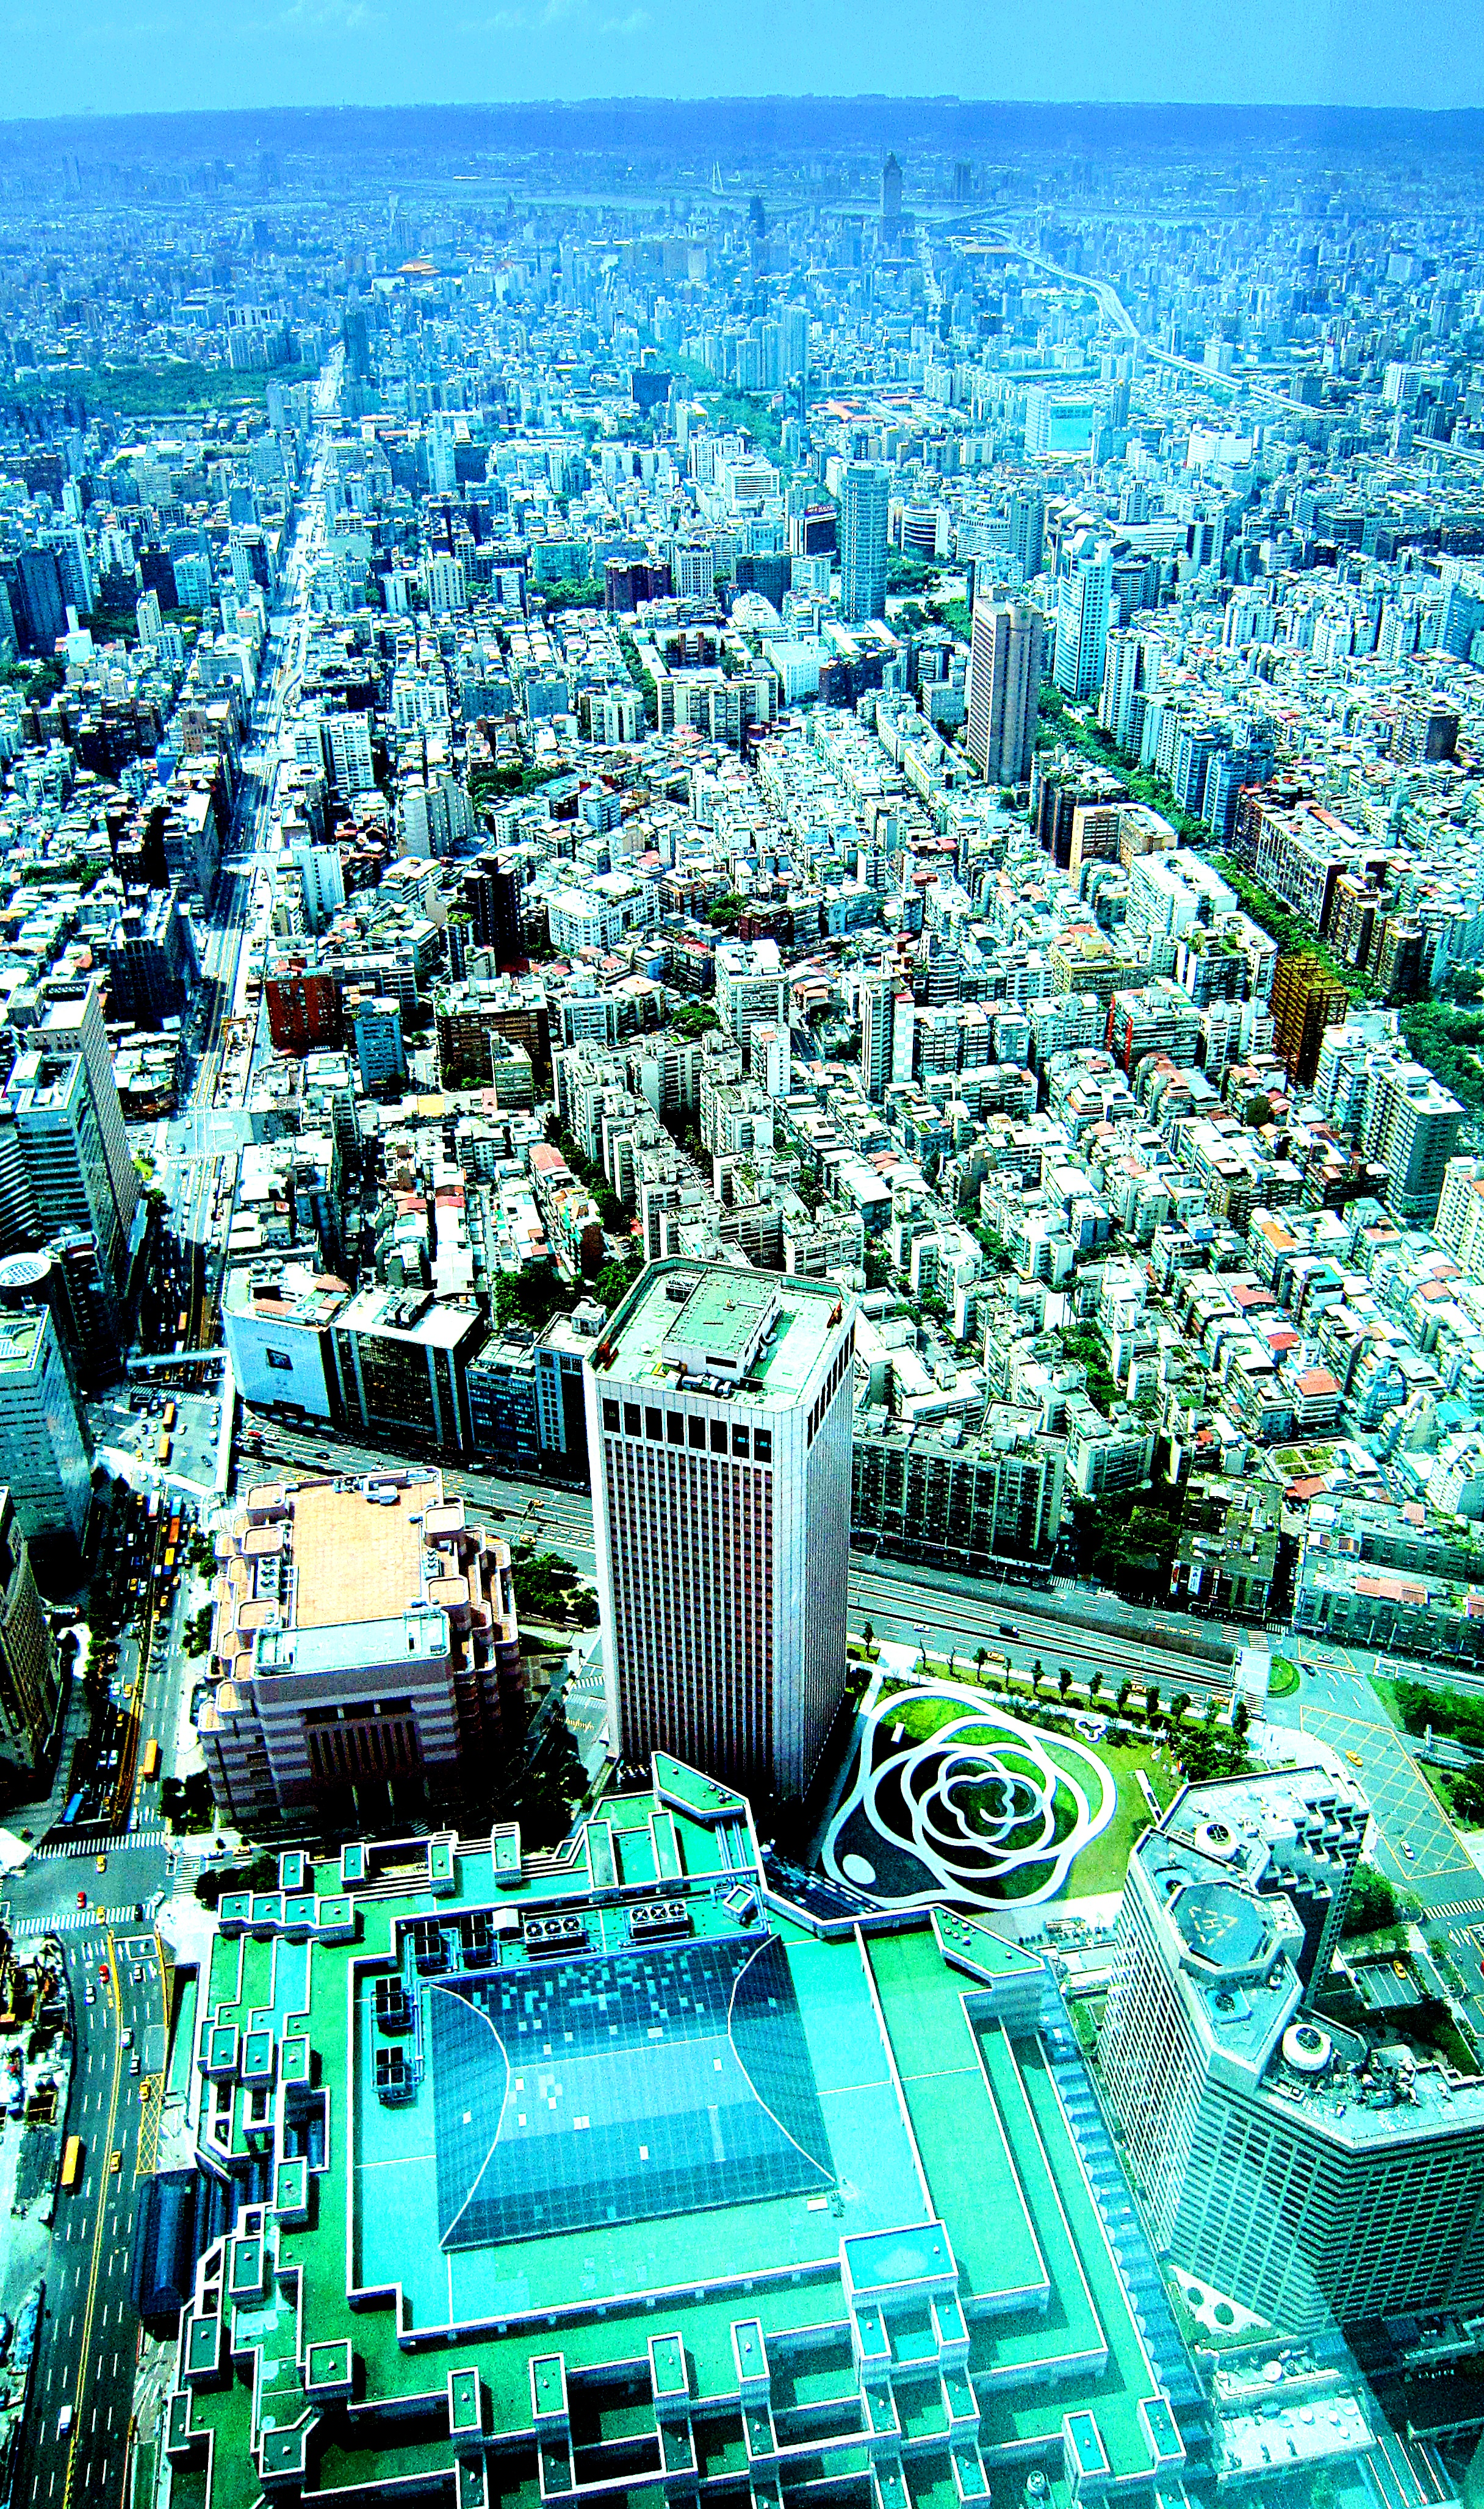 View from the Taipei 101, Taiwan